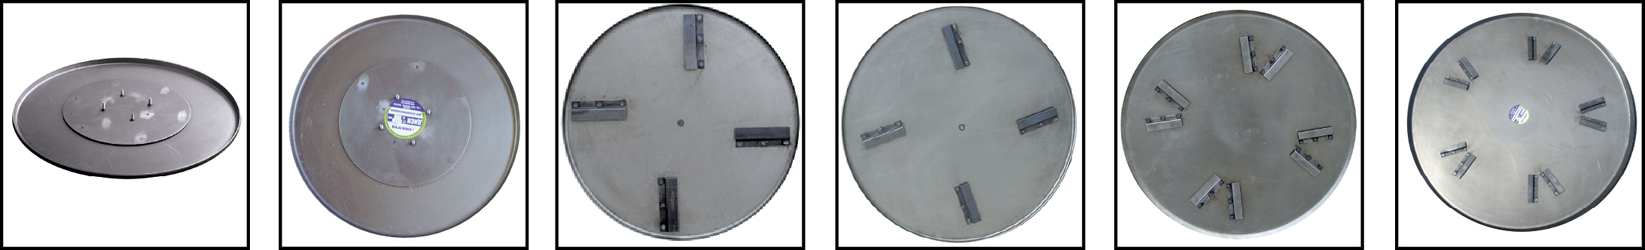 Фото, картинки Диски для затирочных машин СПЕКТРУМ. Затирочные диски по бетону